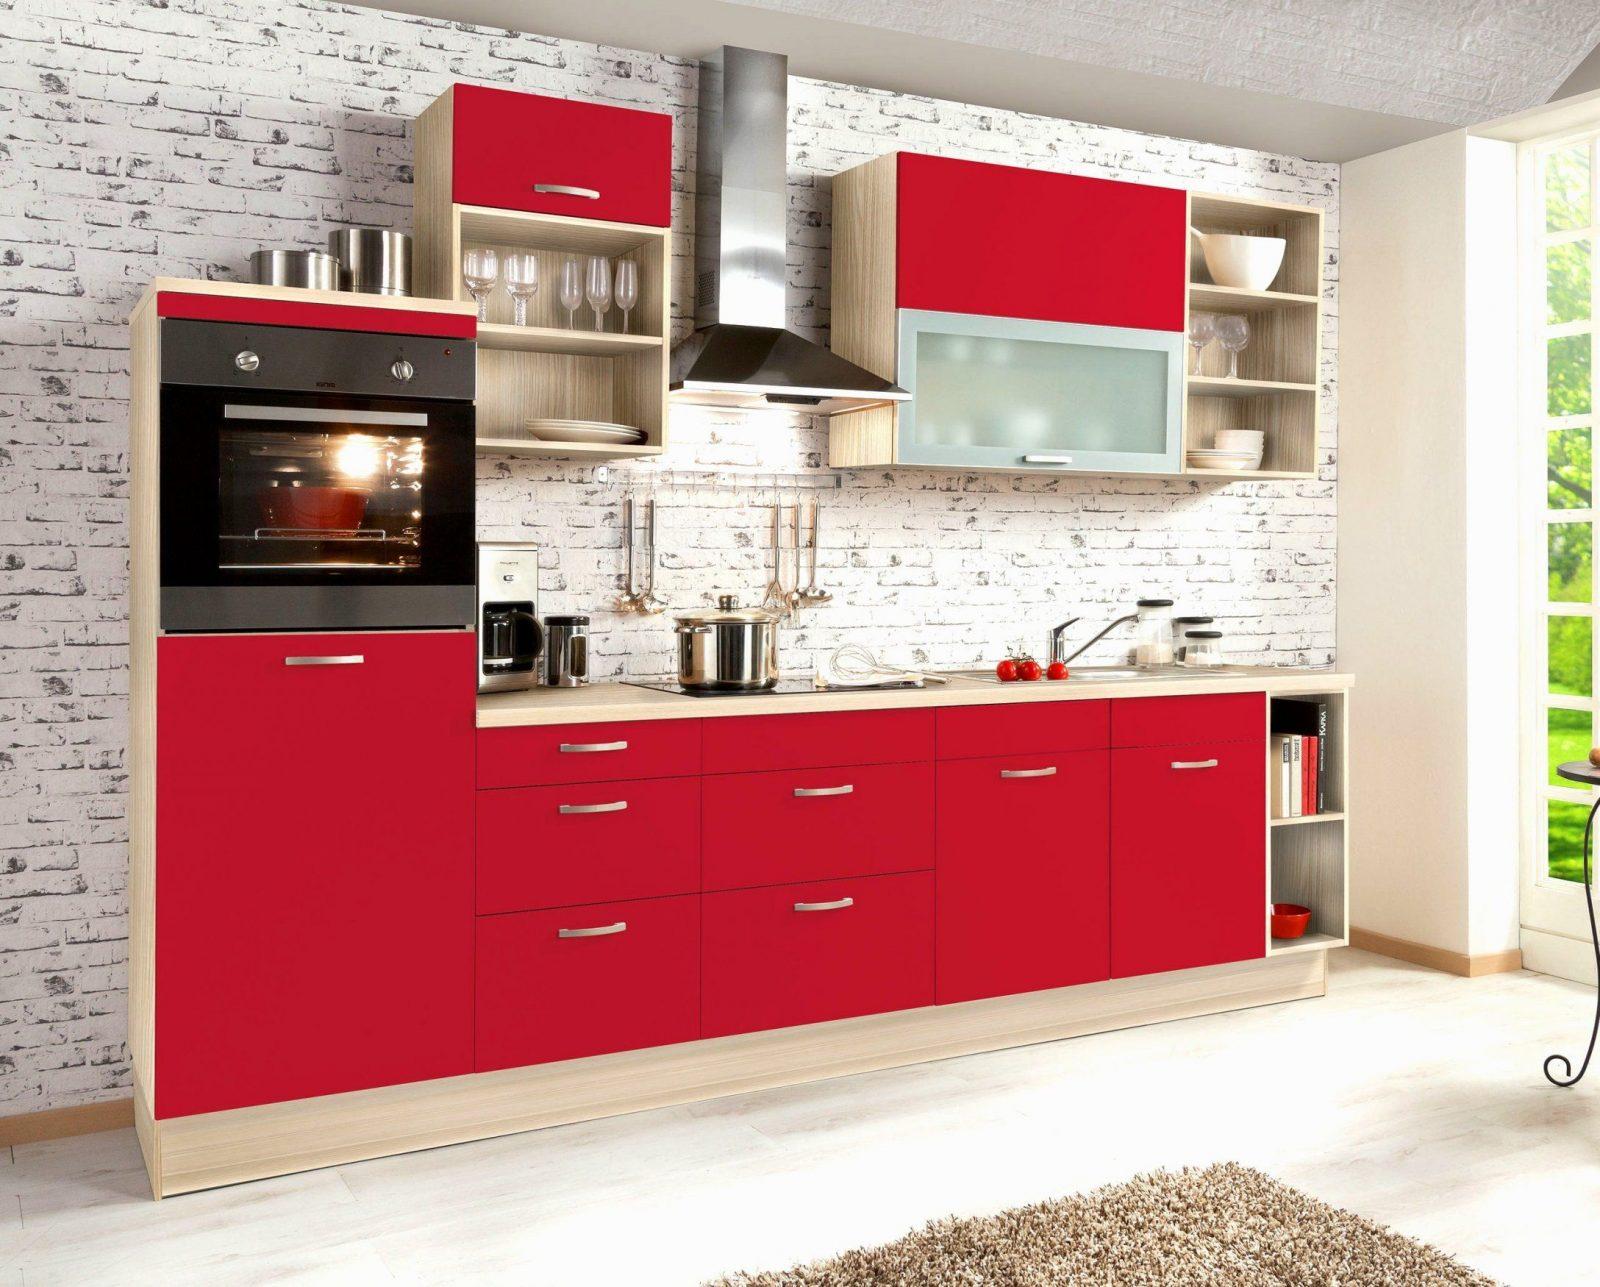 Günstige Einbauküchen Mit Elektrogeräten Schön Awesome Küche von Einbauküchen Mit Elektrogeräten Ikea Photo